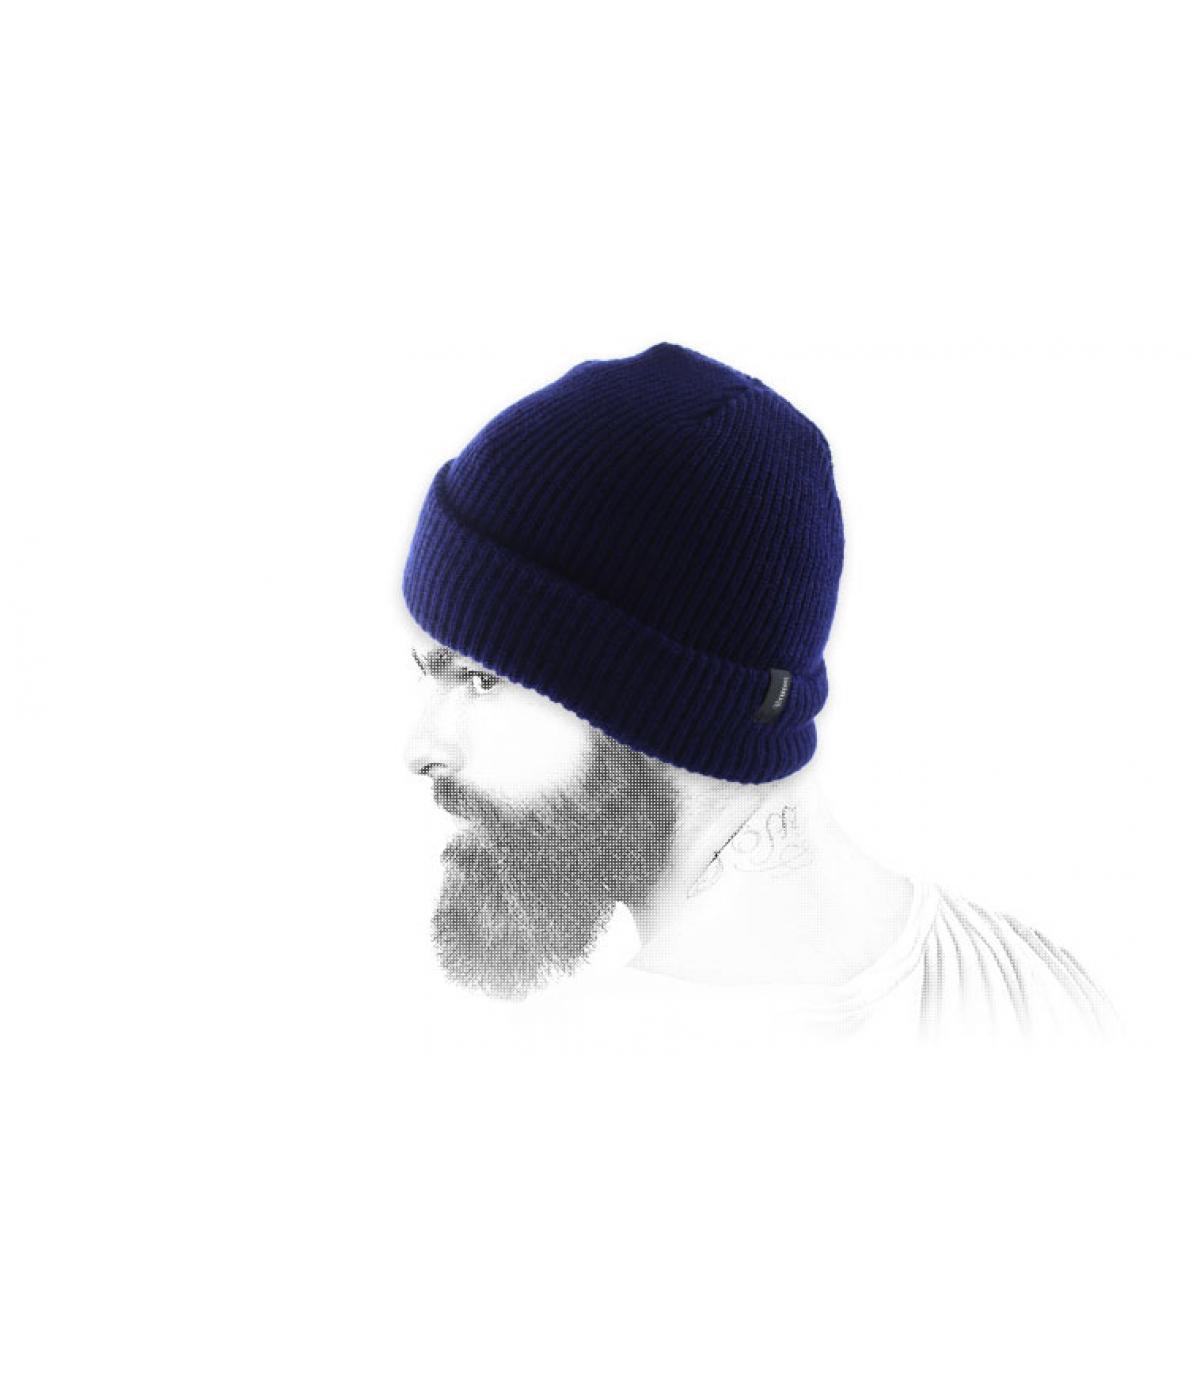 Gorro Brixton azul marine